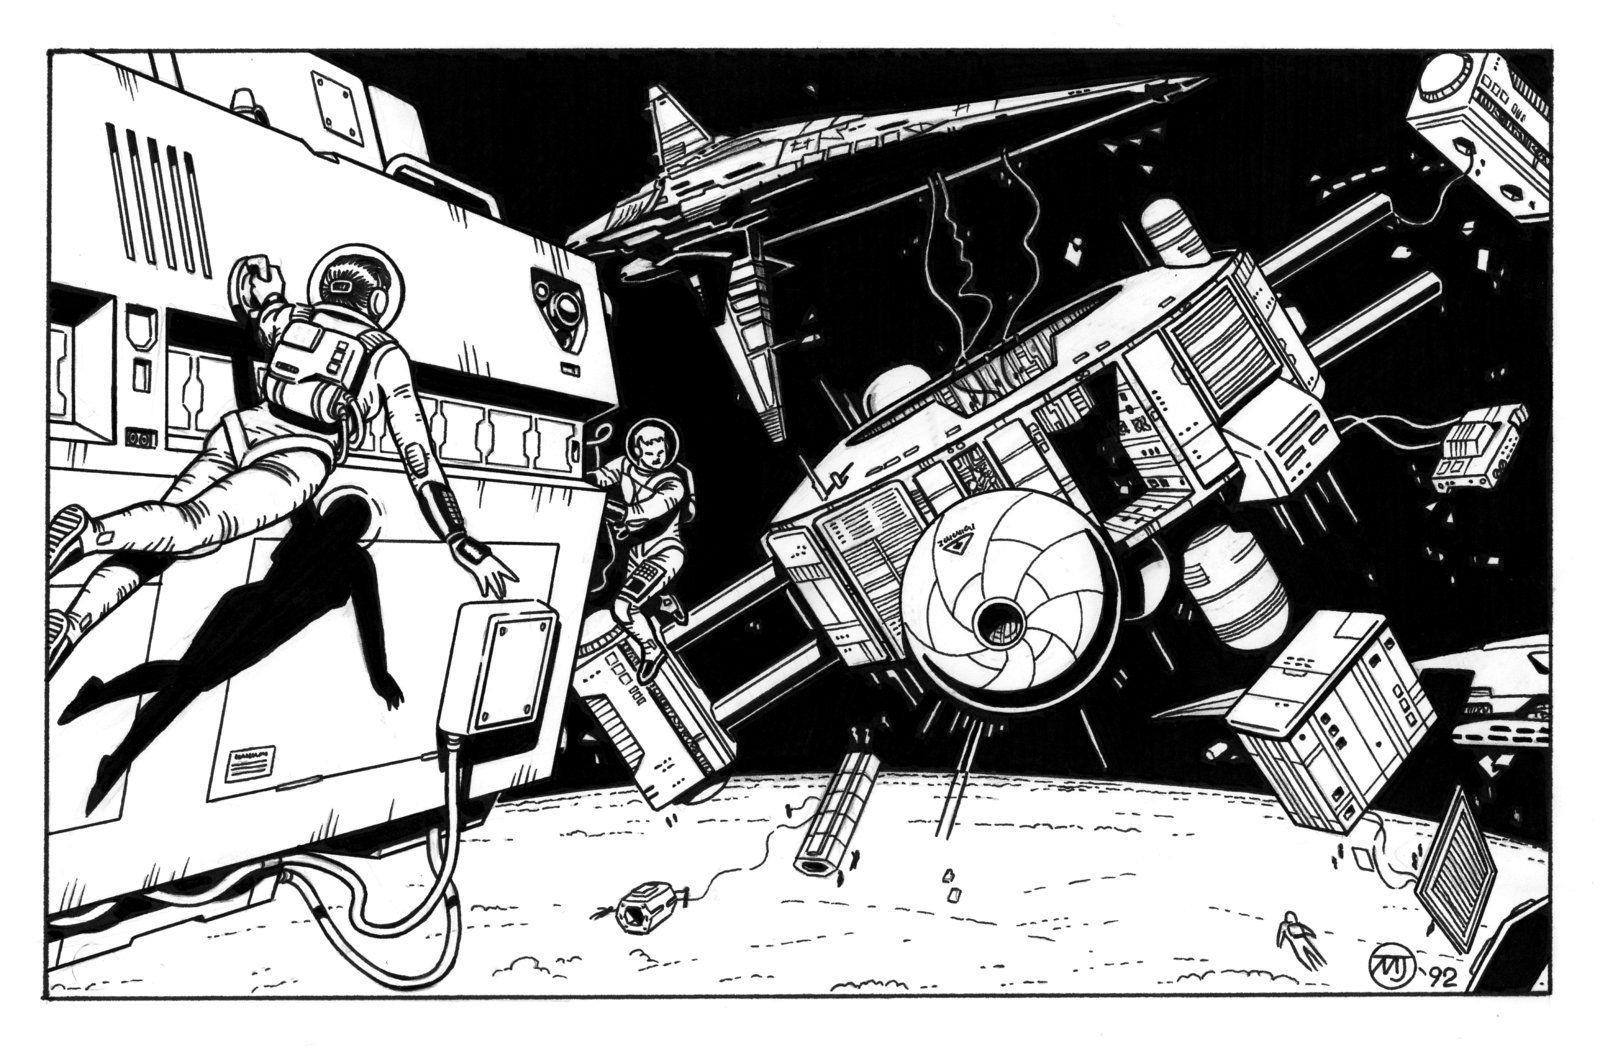 Renegade Legion - Space Construction by SteamPoweredMikeJ.deviantart.com on @DeviantArt